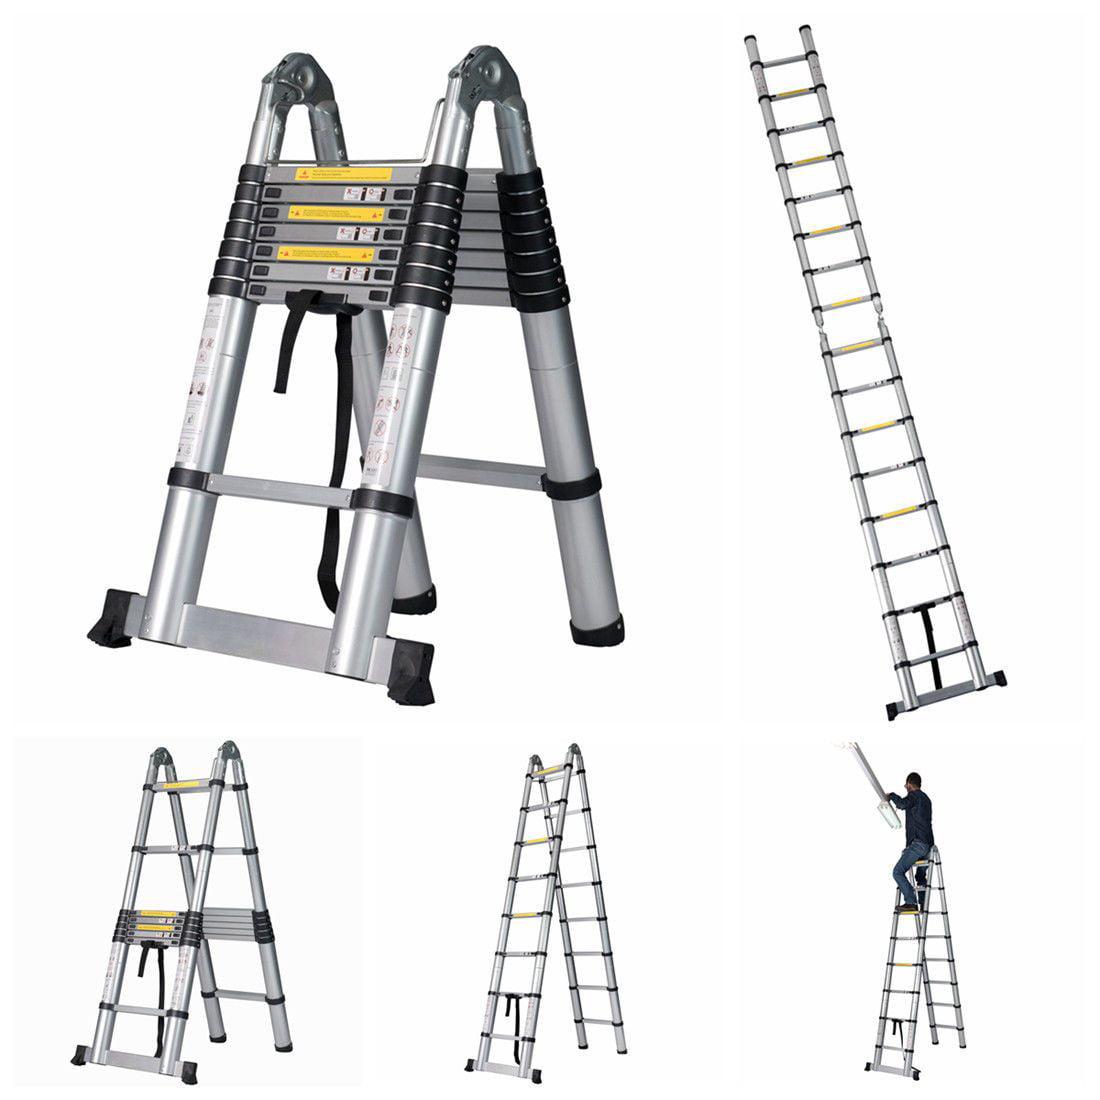 16.5' FT EN131 Folding Aluminum Multi Purpose Attic Telescoping Ladder Extension